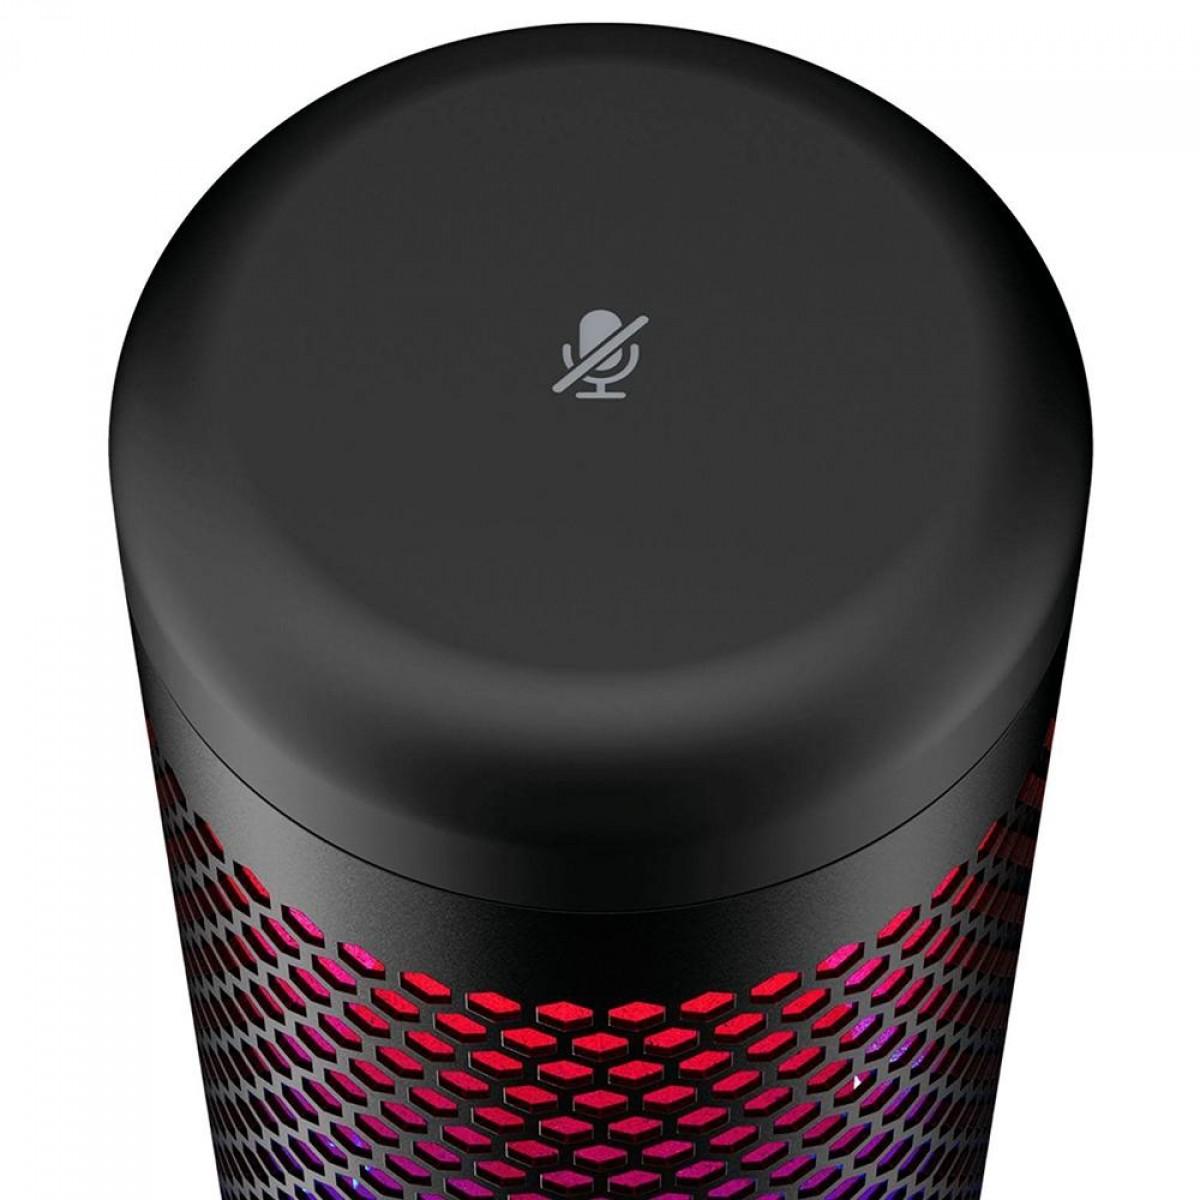 Microfone HyperX QuadCast S, USB, LED RGB, HMIQ1S-XX-RG/G